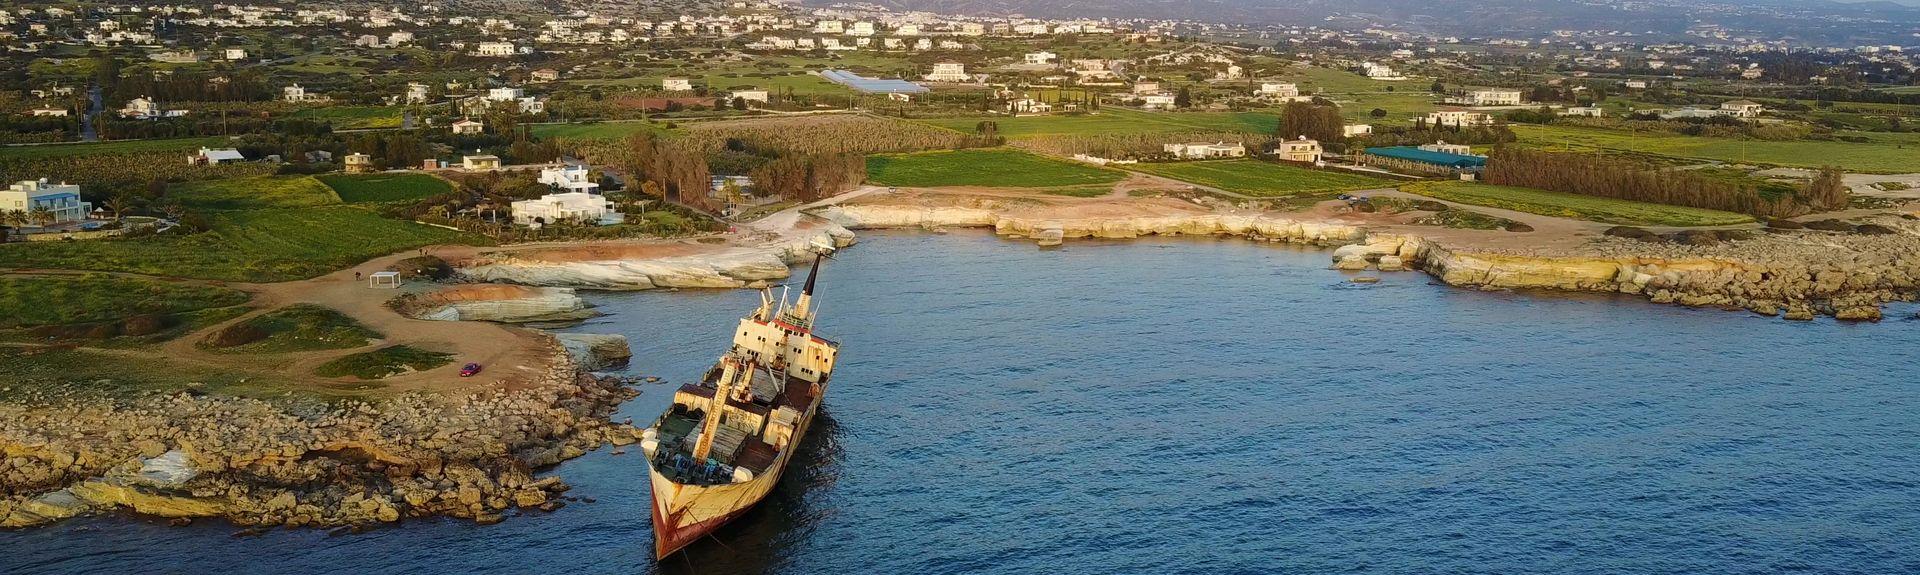 Pegeia, Bezirk Paphos, Zypern